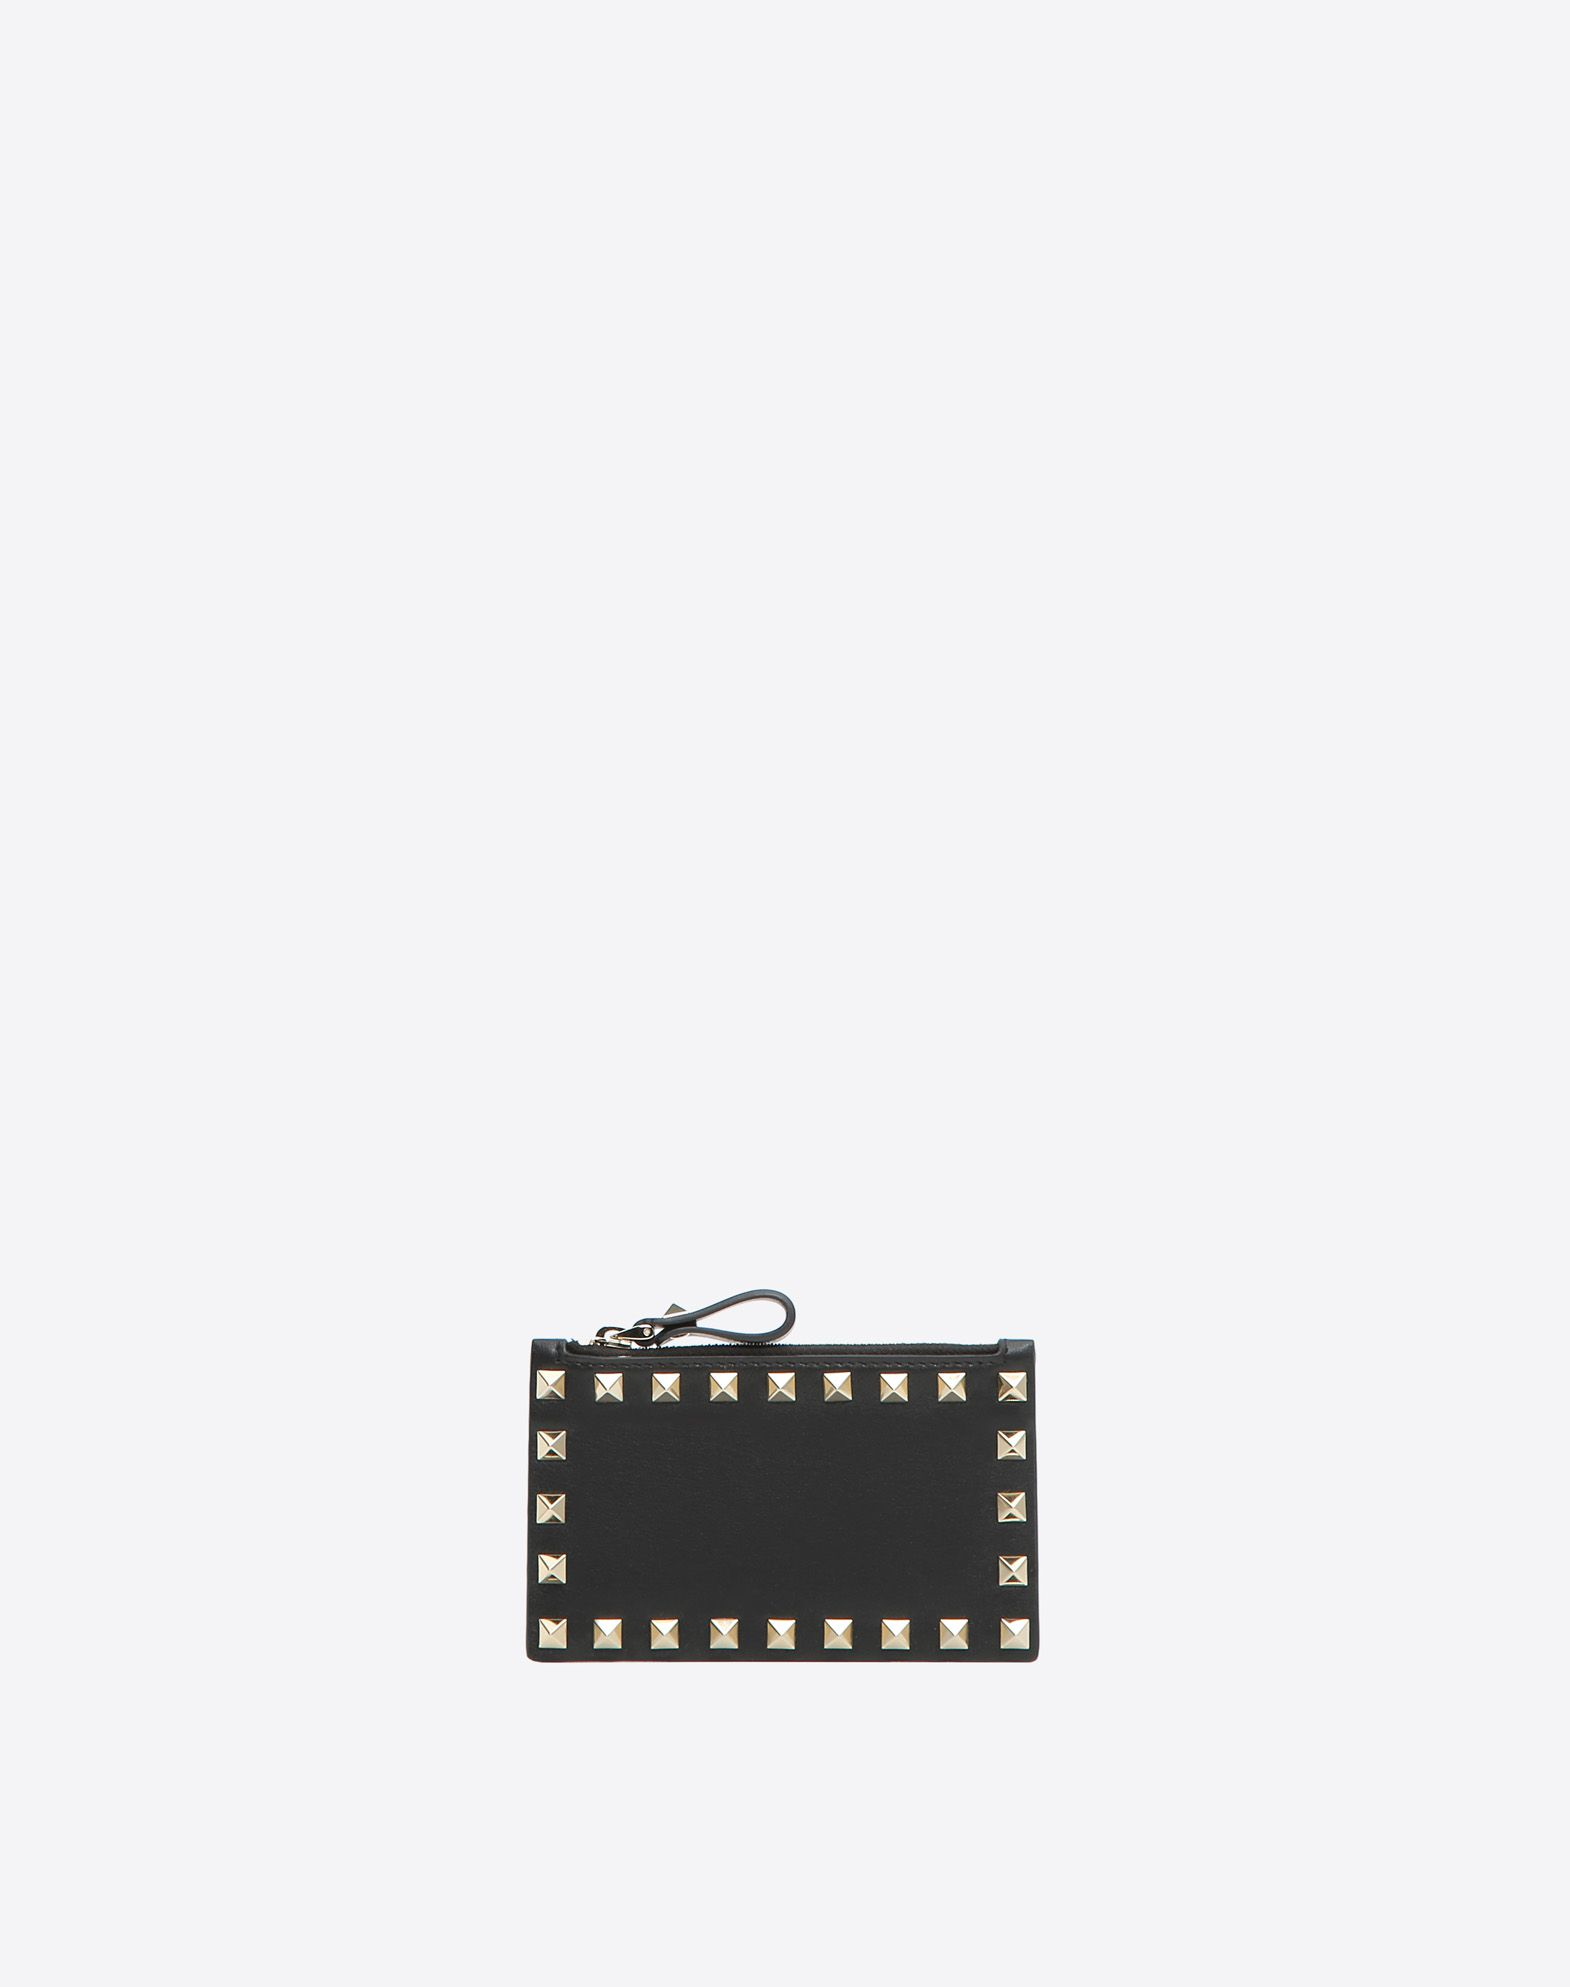 porte monnaie et tui rockstud portefeuilles femme valentino garavani boutique en ligne valentino. Black Bedroom Furniture Sets. Home Design Ideas